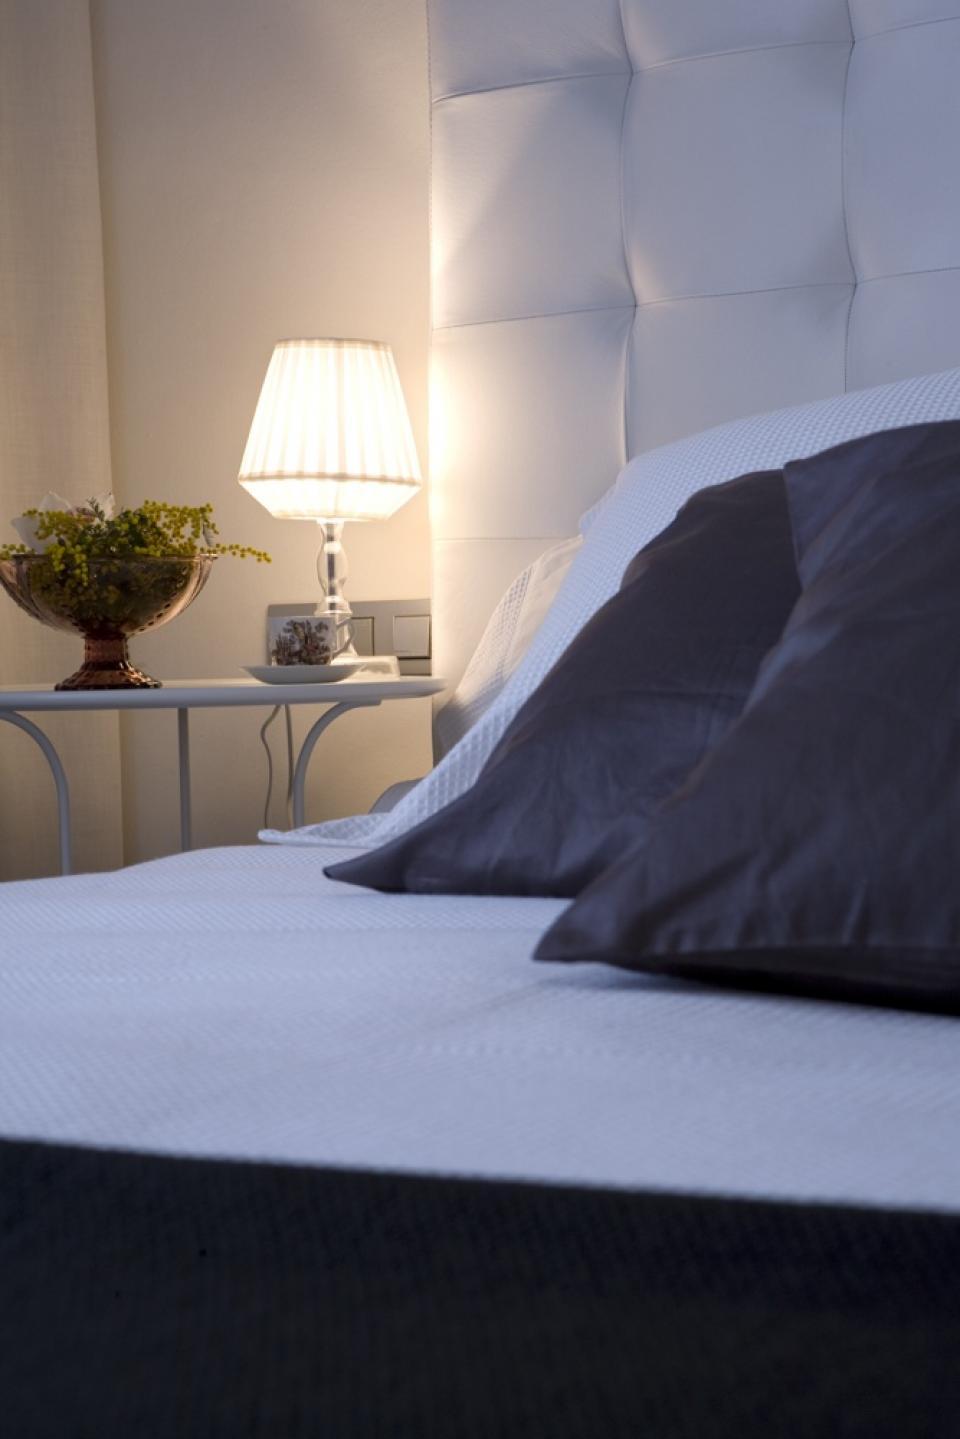 Luxury rental apartment Barcelona   Barcelona-Home